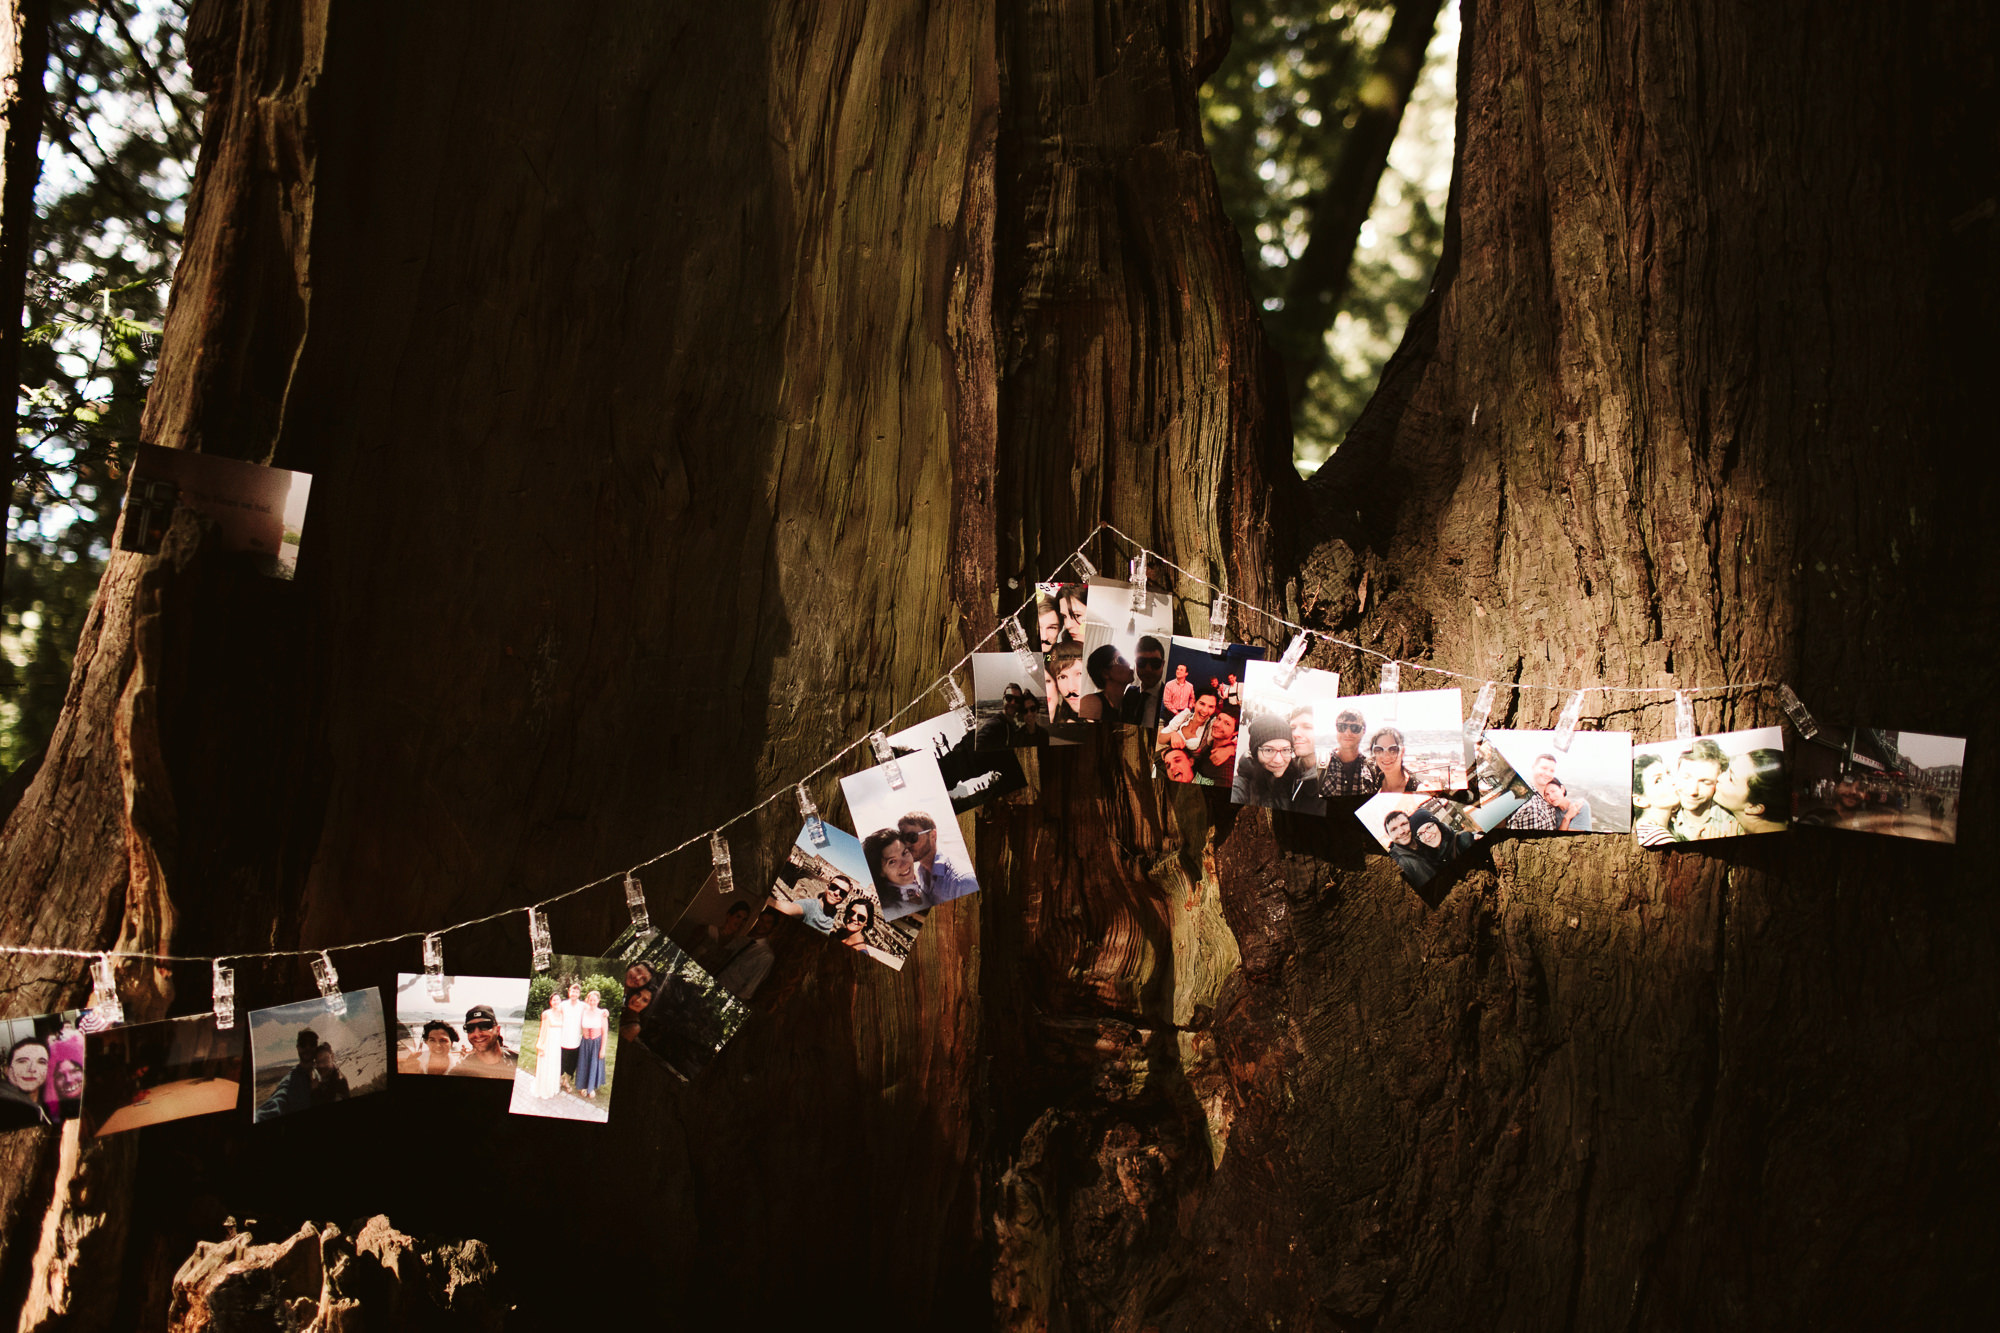 California-wedding-photographer-alfonso-flores-pamplin-groove-105.jpg